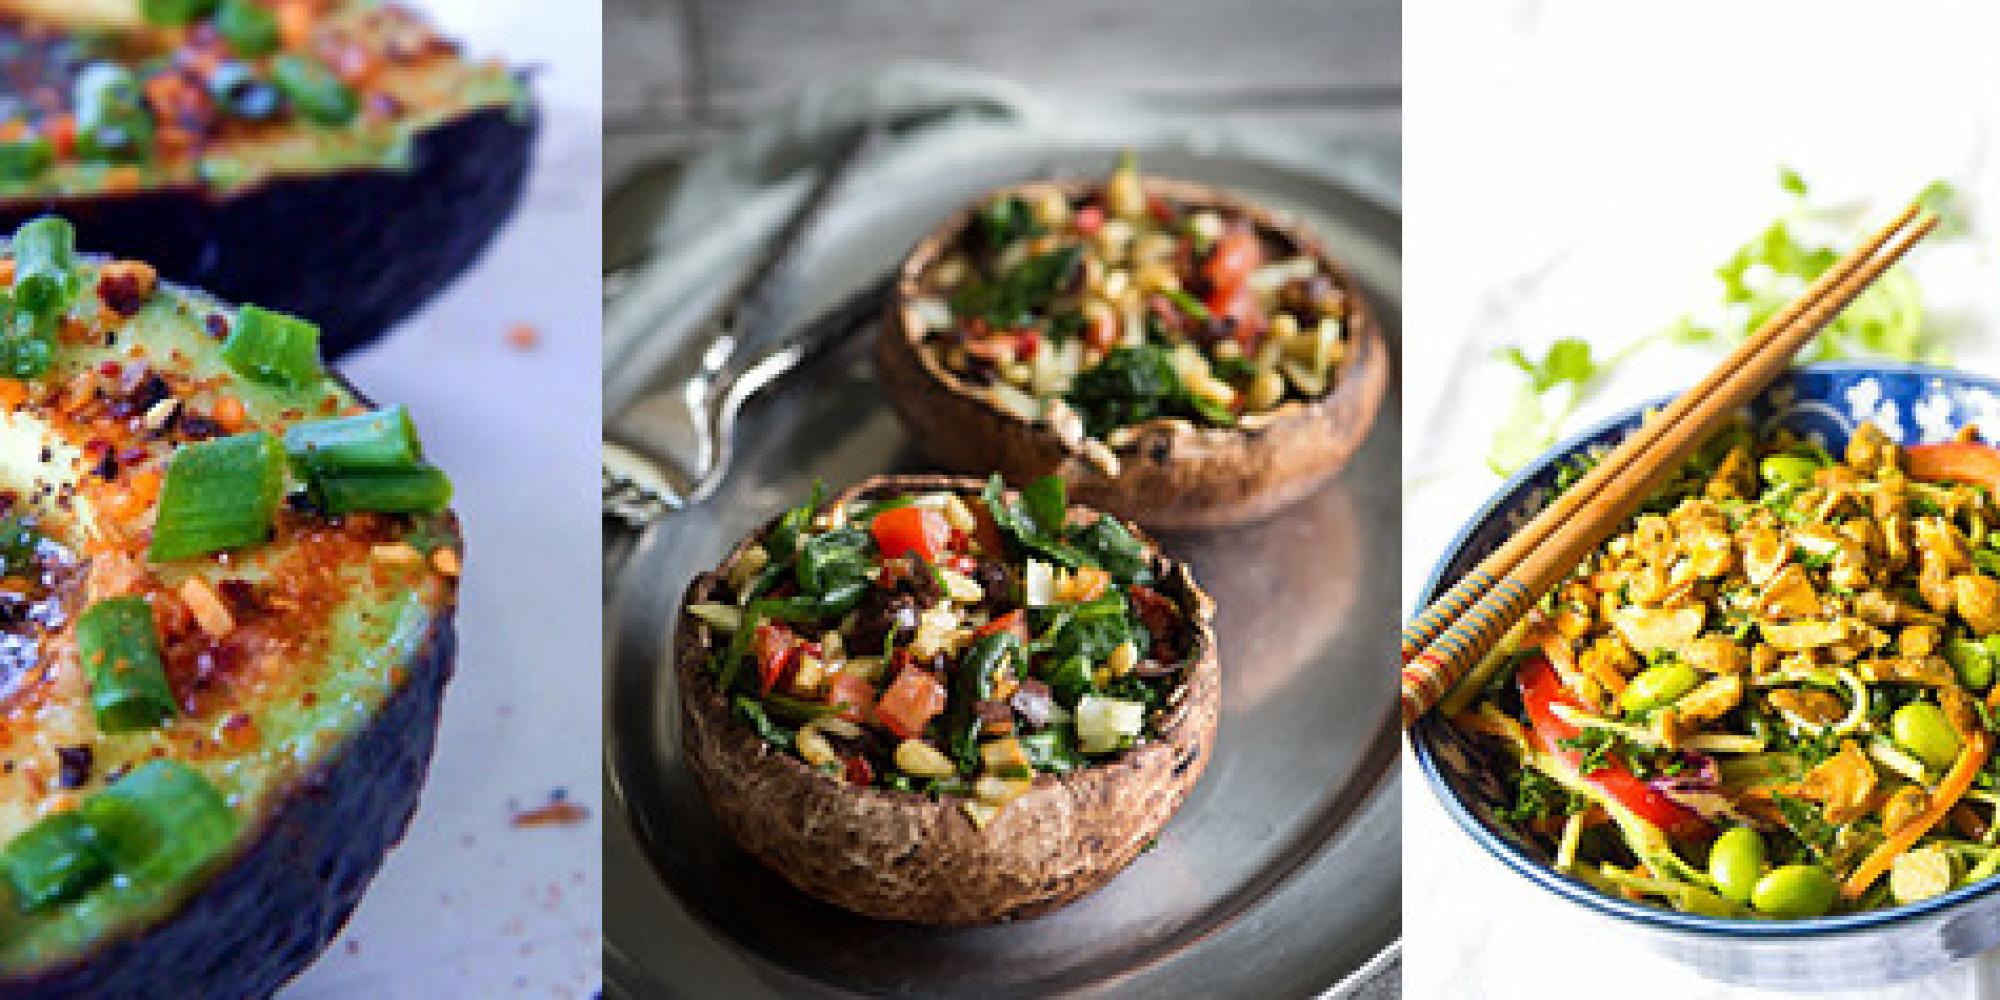 Healthy Raw Vegan Recipes  Raw Vegan Recipes 15 Easy And Healthy Lunch Ideas